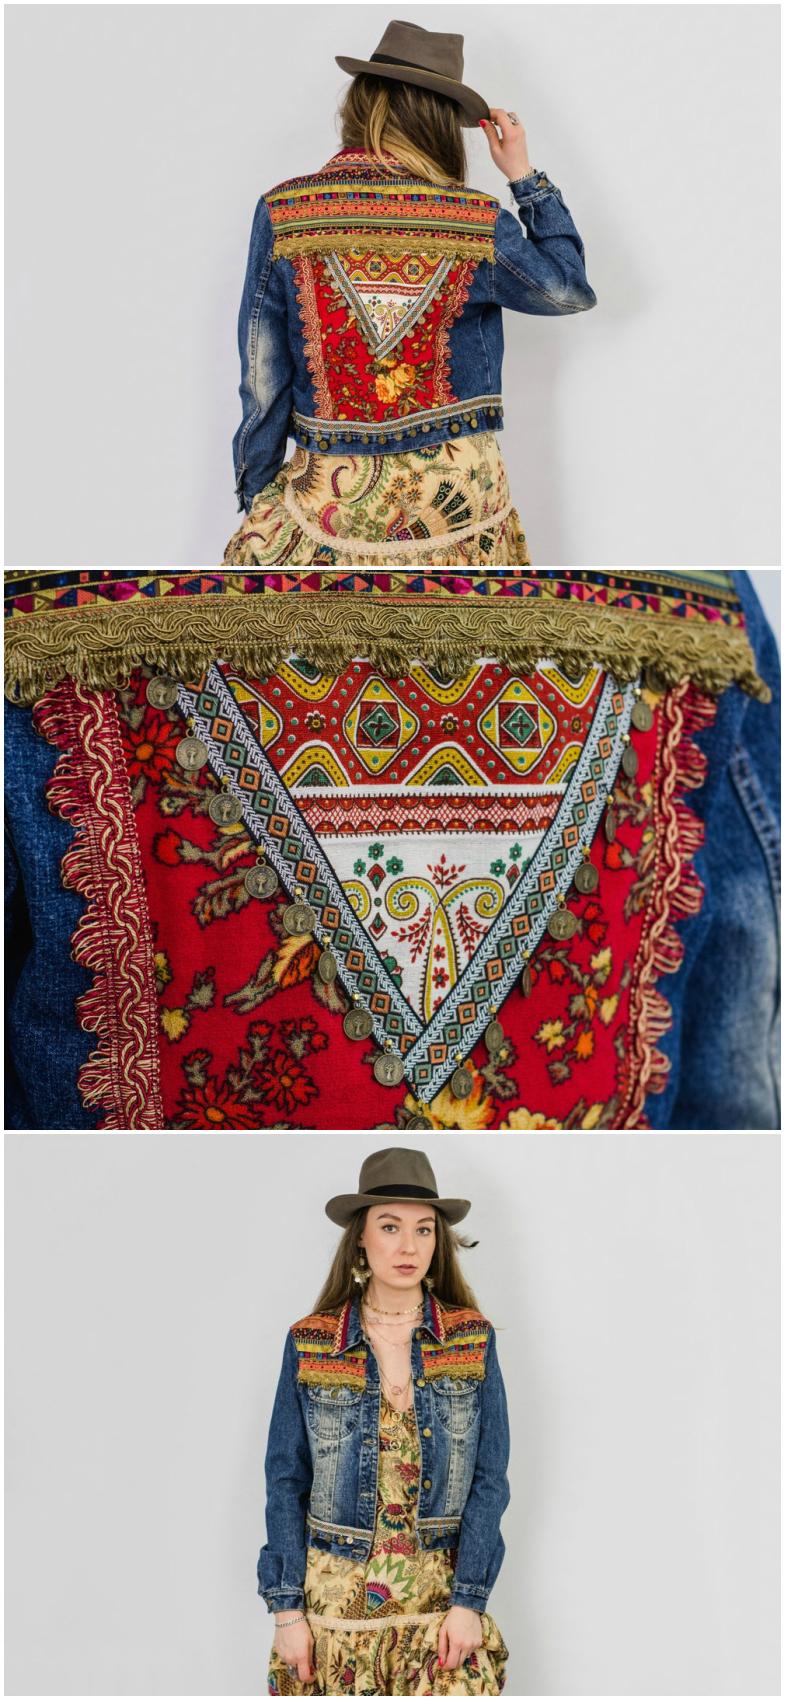 Festival Outfit Jeansjacke Mit Aztekischem Muster Boho Jacke Mit Fransen Und Spitze Festival Fashion Jeans Jacket Wi Jeansjacke Jacken Mantel Frauen